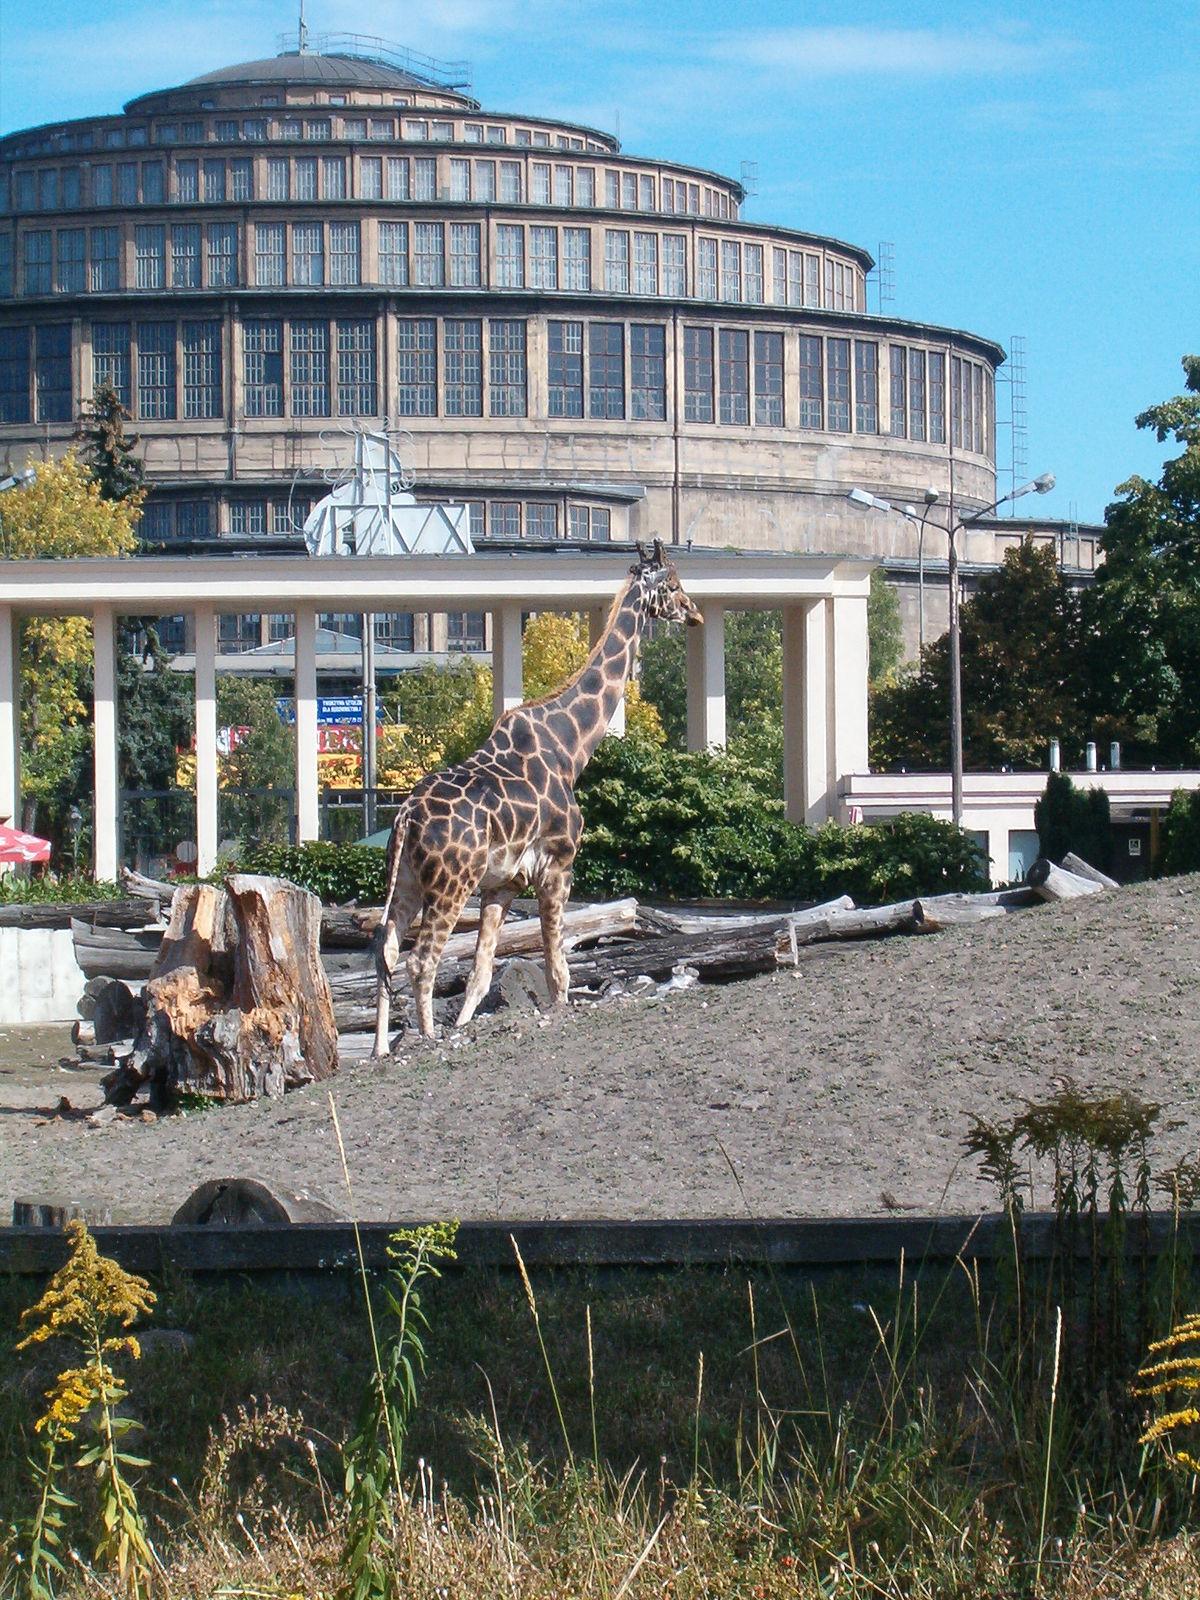 Zoologischer Garten Breslau  Wikipedia